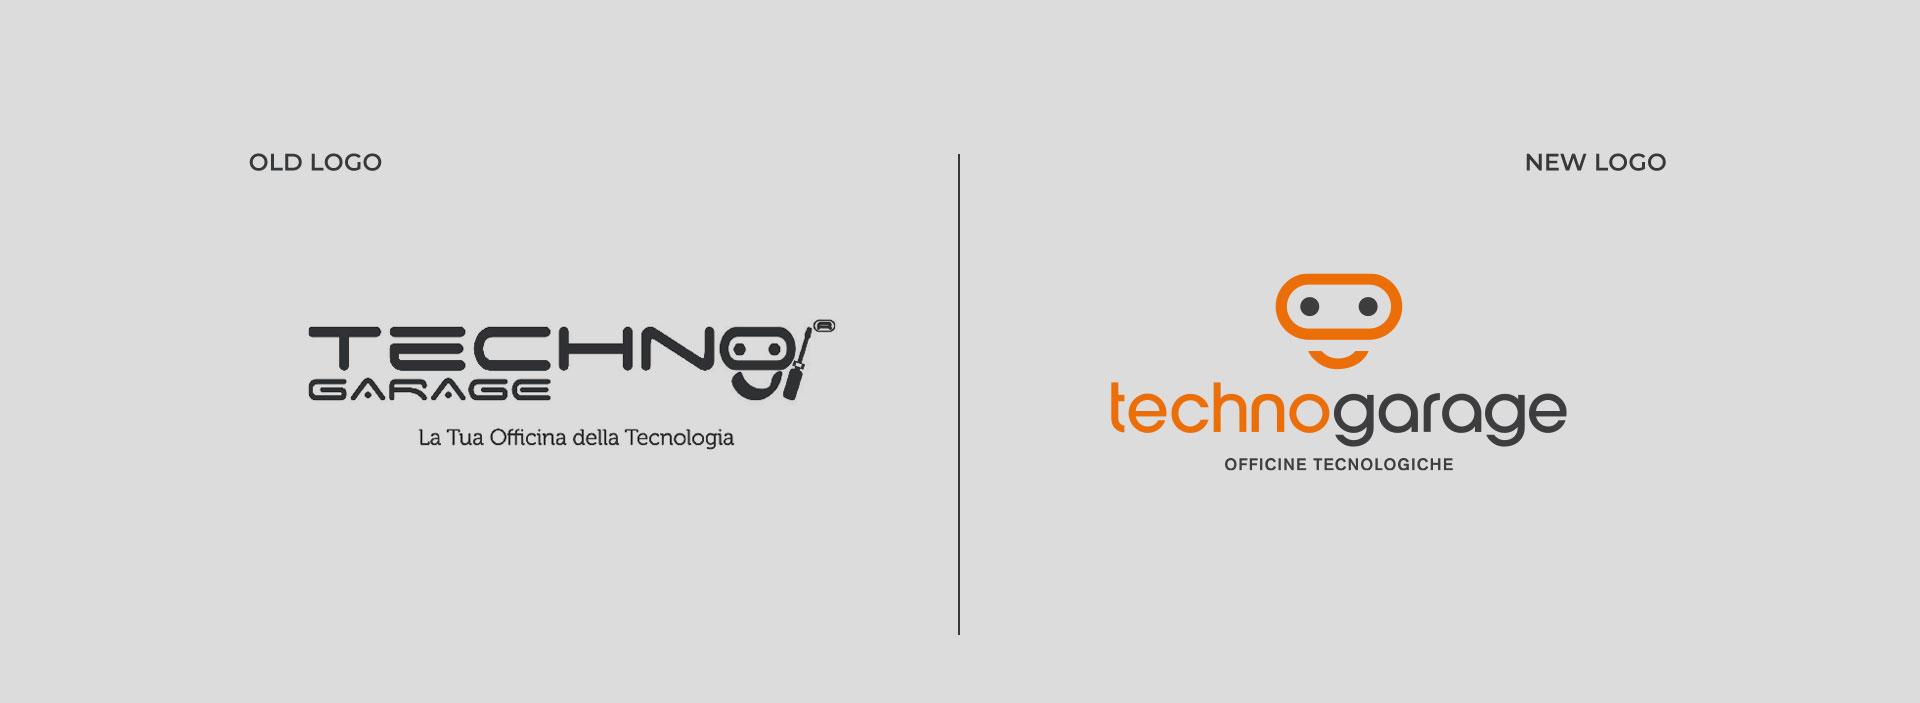 technogarage-zerouno-design-logo-restyle-rebranding